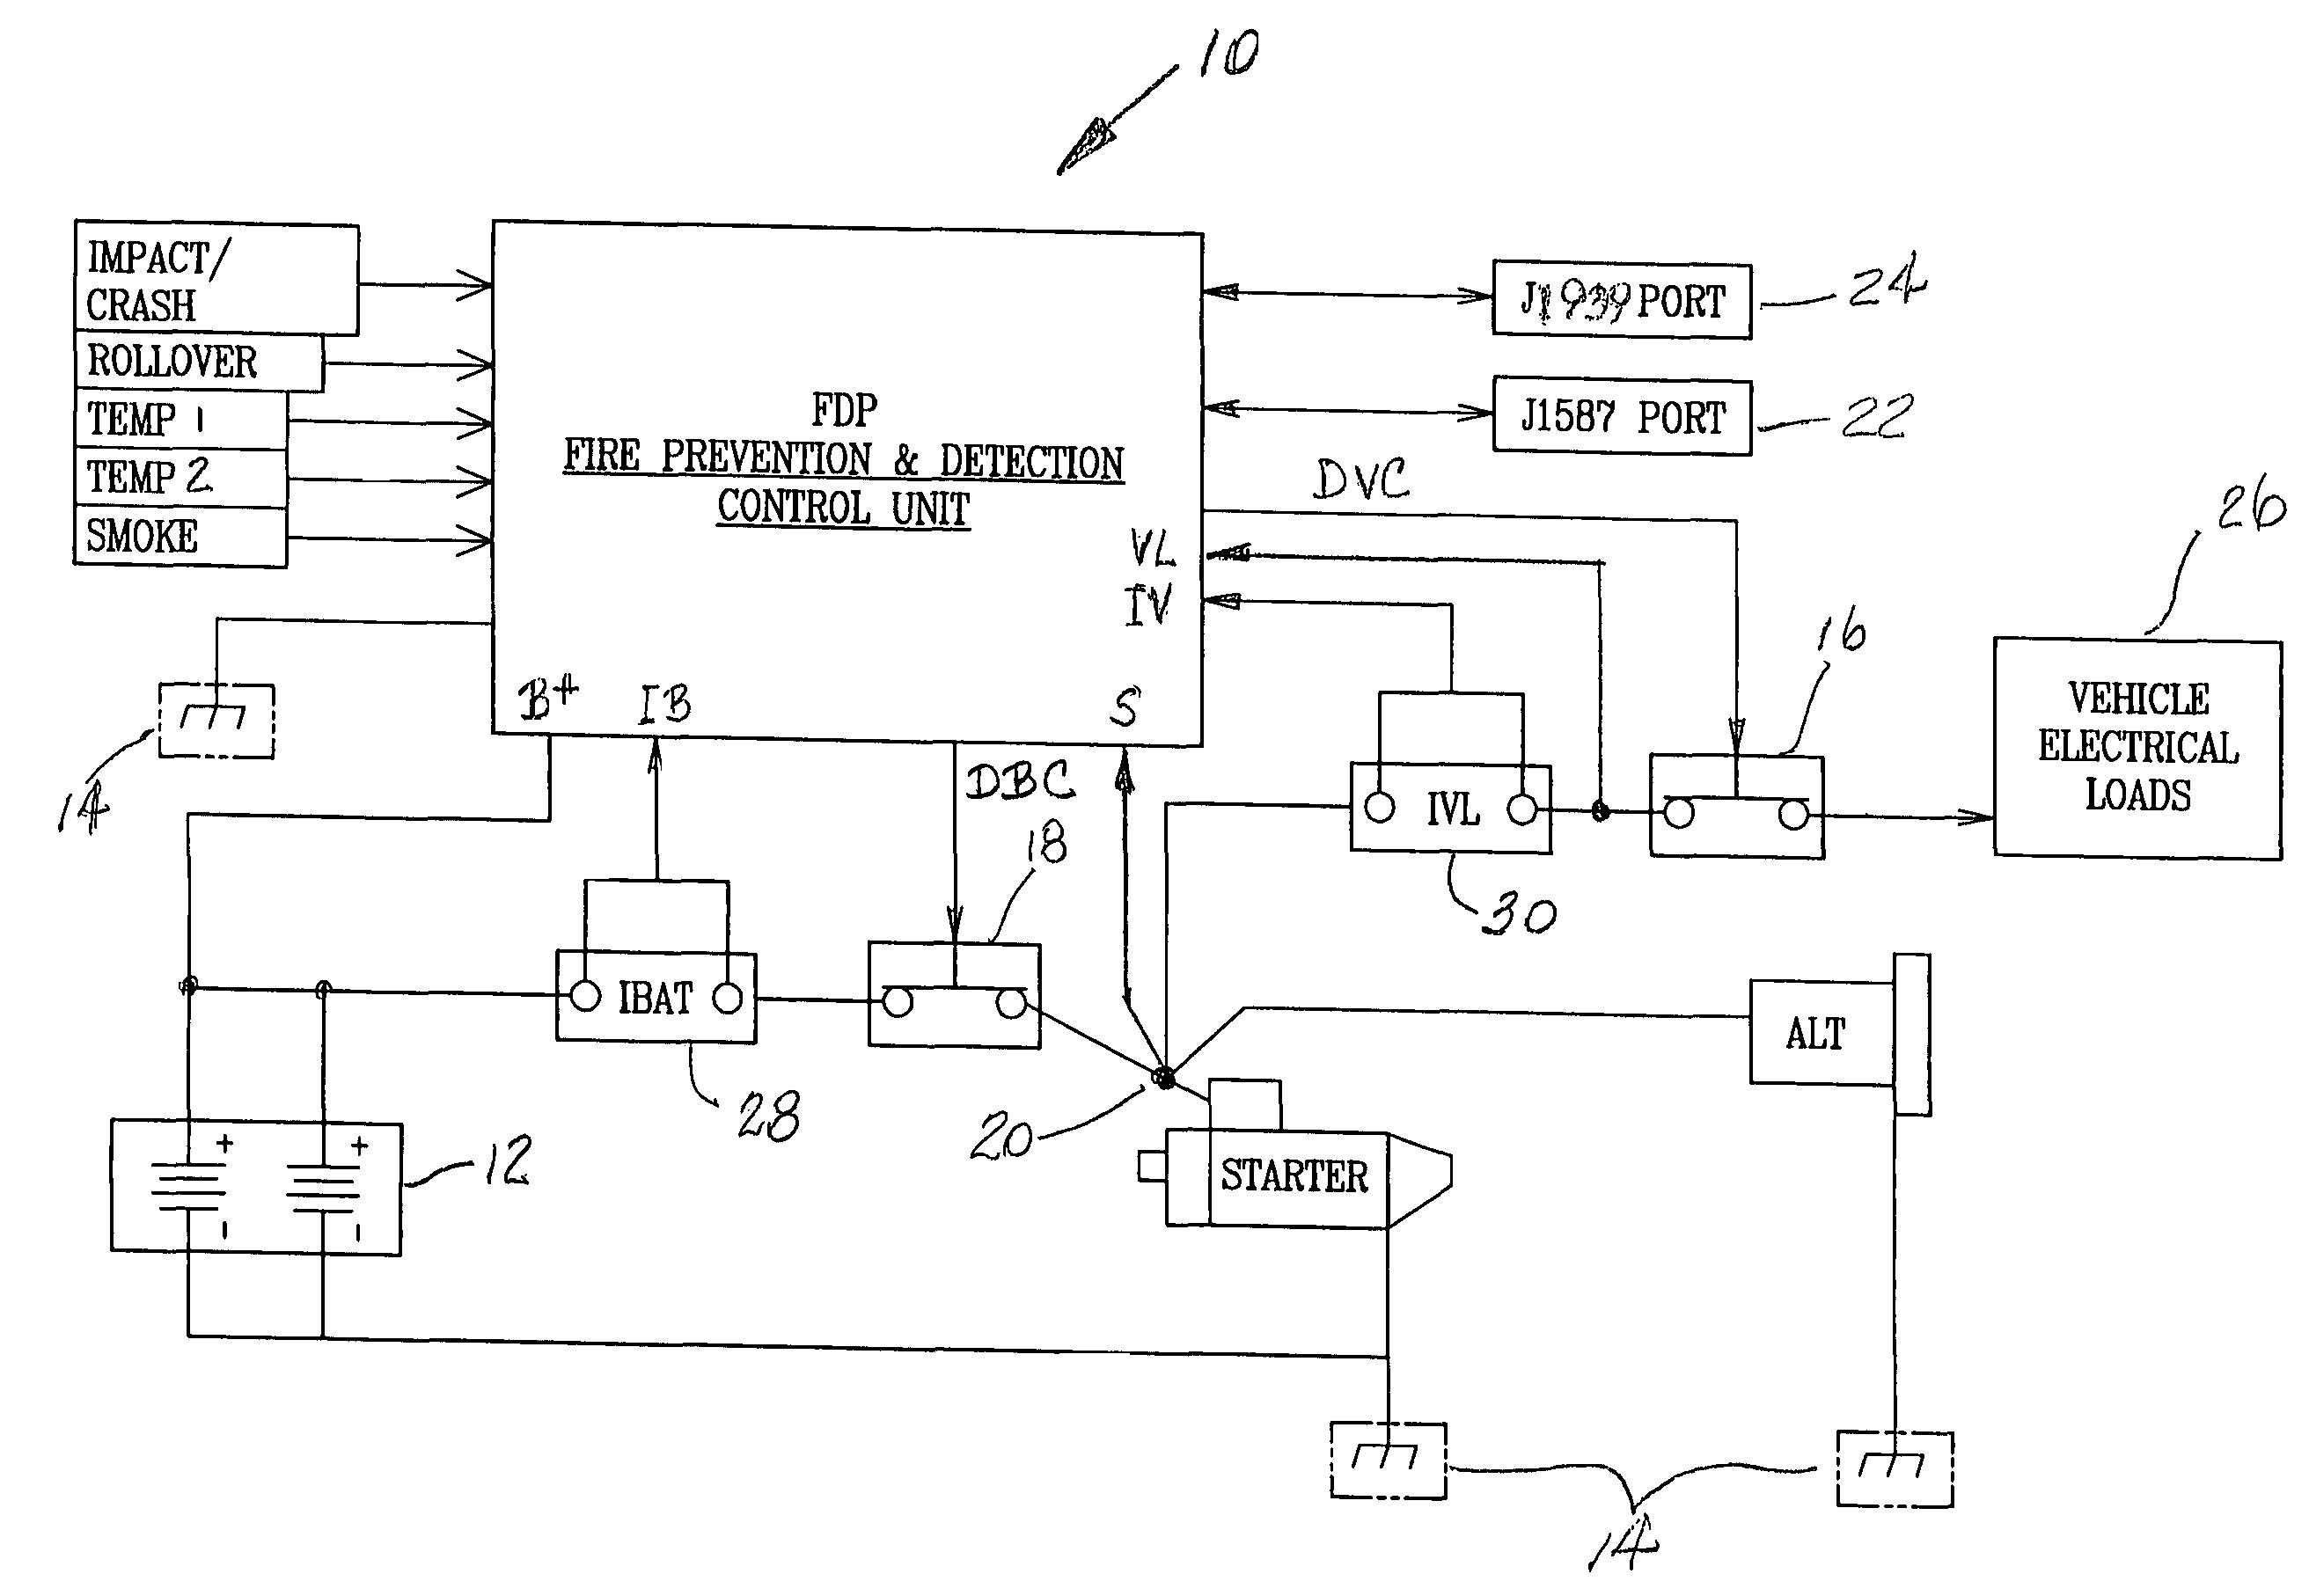 94t Au Car Alarm Wiring Diagram Third Level Installation Diagrams Along With Flashpoint Schema